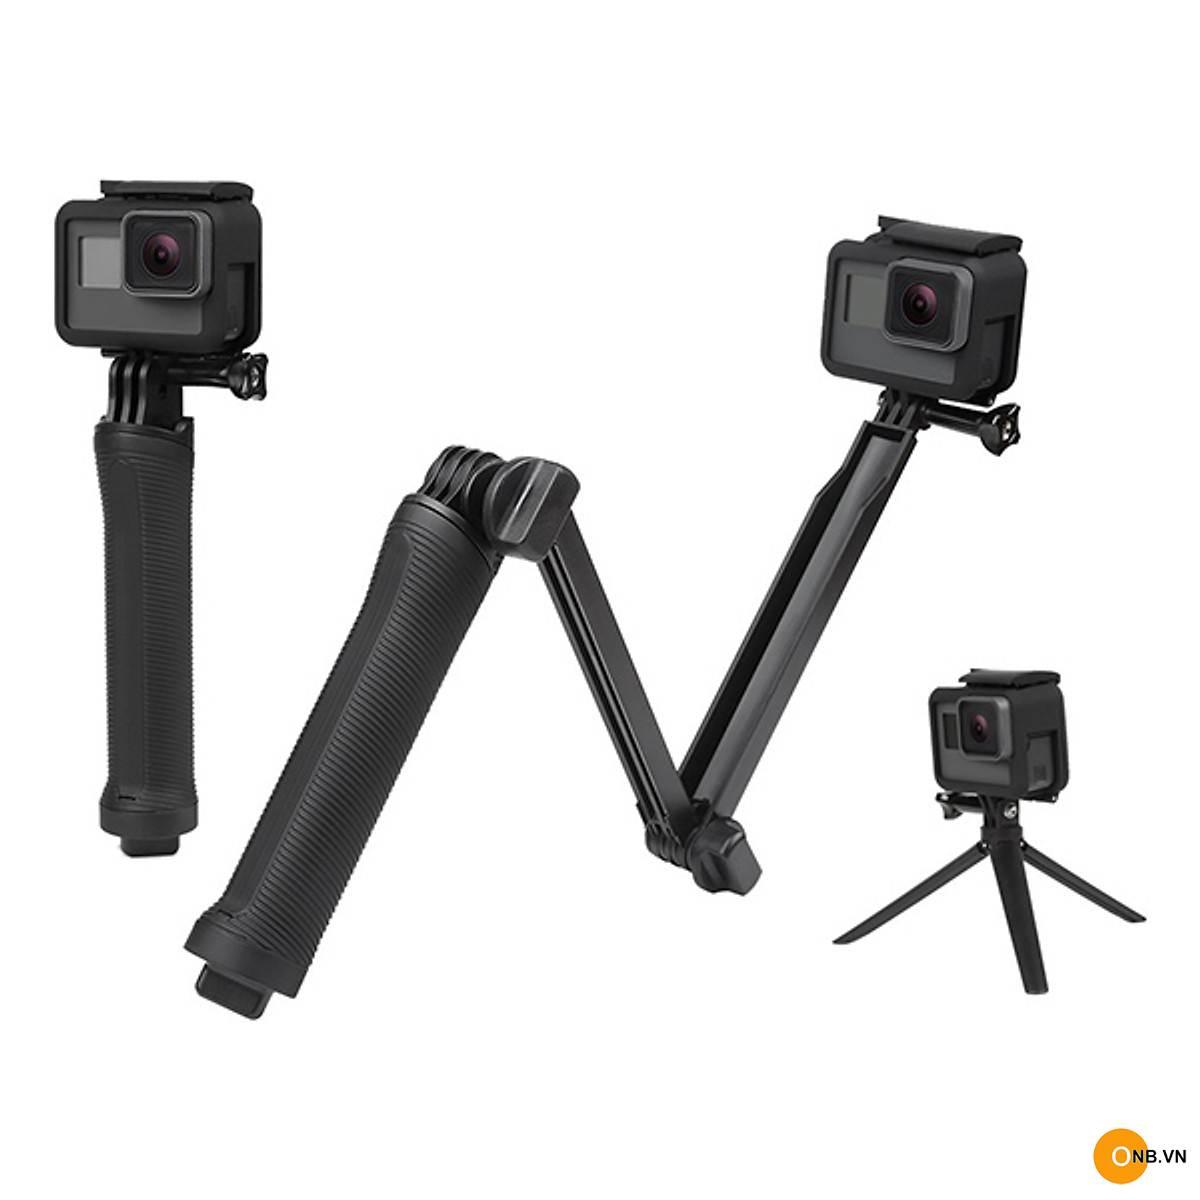 Gậy 3 Ways 3 khúc Mono Tripod dành cho GoPro, Osmo Action Pocket